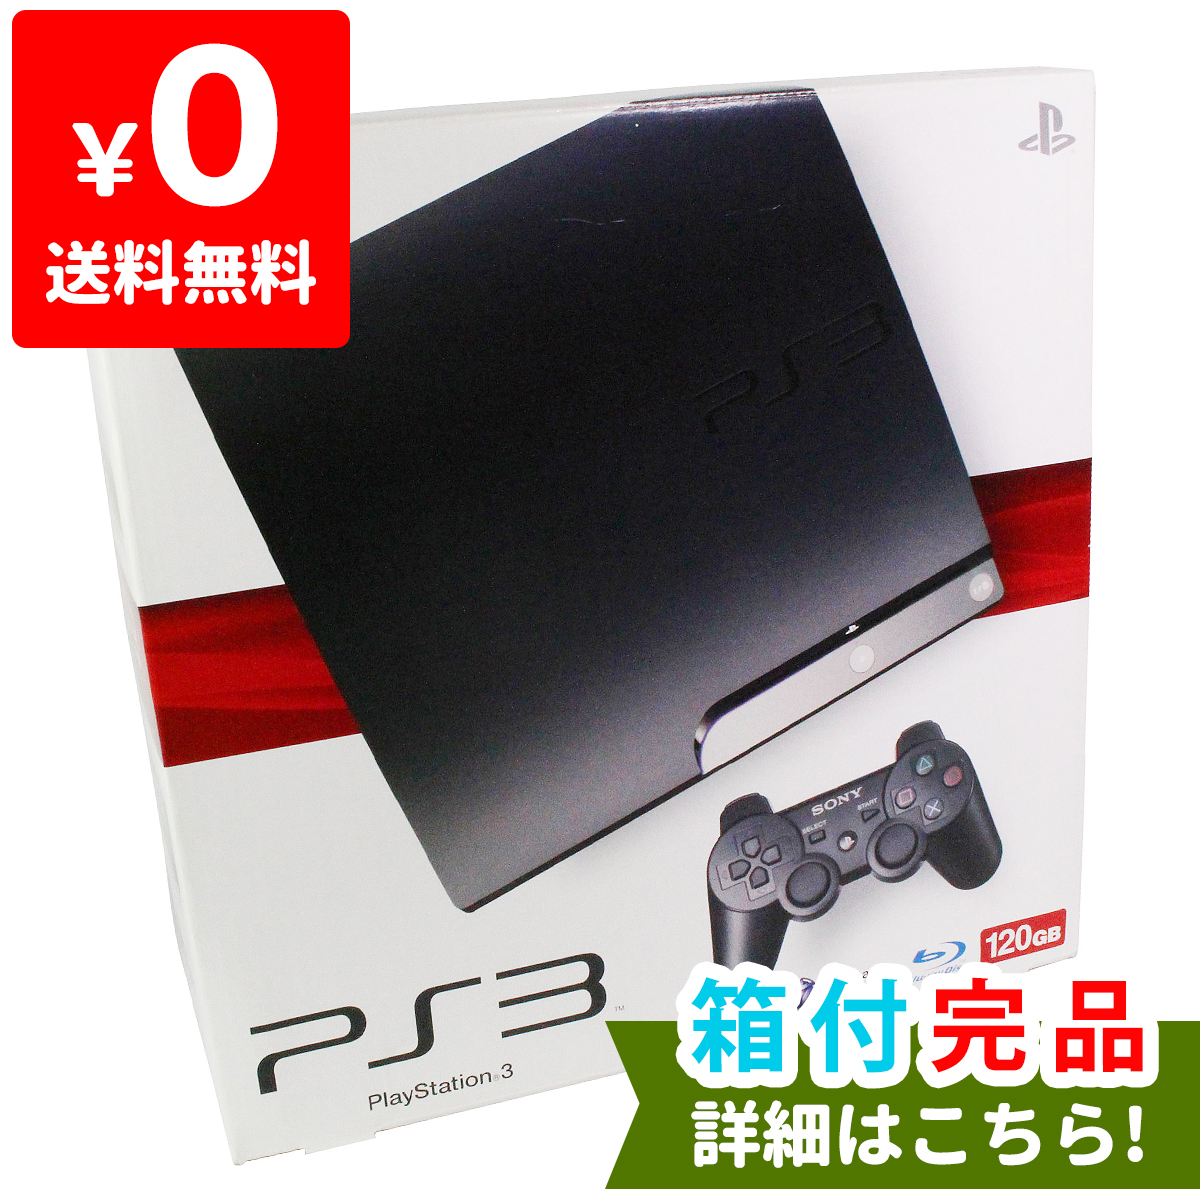 PS3 プレステ3 PlayStation 3 (120GB) チャコール・ブラック (CECH-2000A) SONY ゲーム機 中古 すぐ遊べるセット 完品 4948872412209 送料無料 【中古】